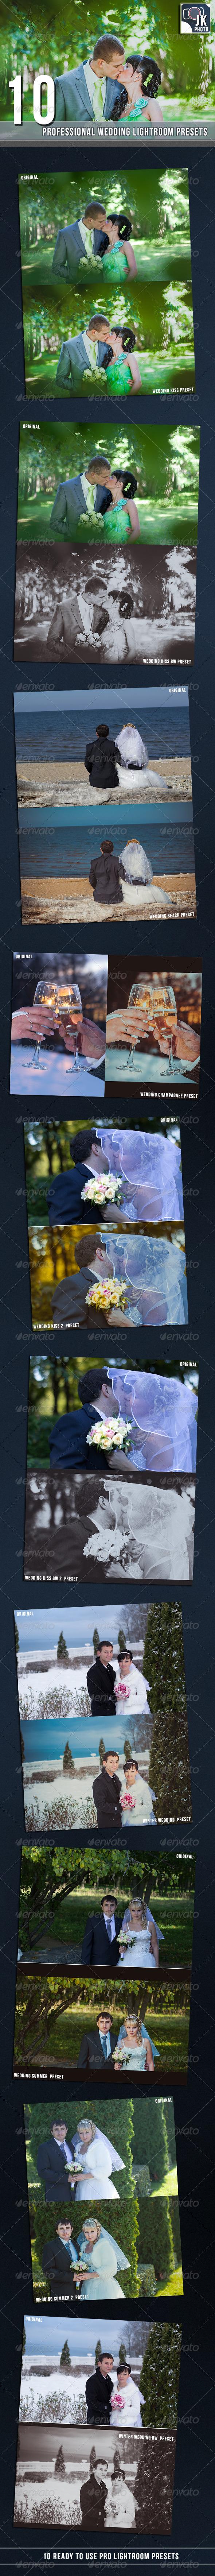 GraphicRiver 10 PRO Lightroom Presets Wedding 6848151